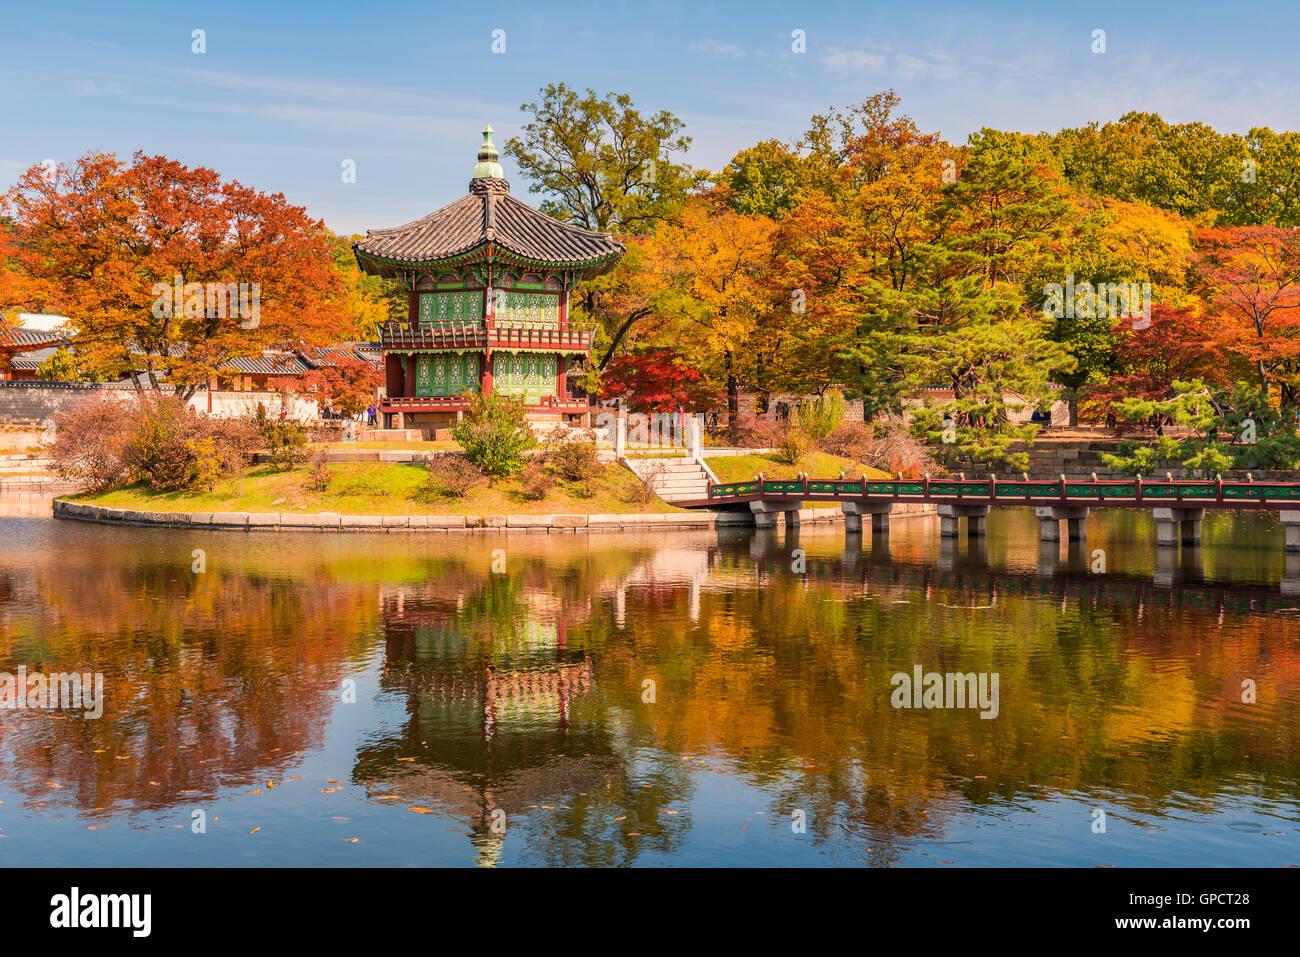 Gyeongbokgung Palace in seoul,Korea - Stock Image